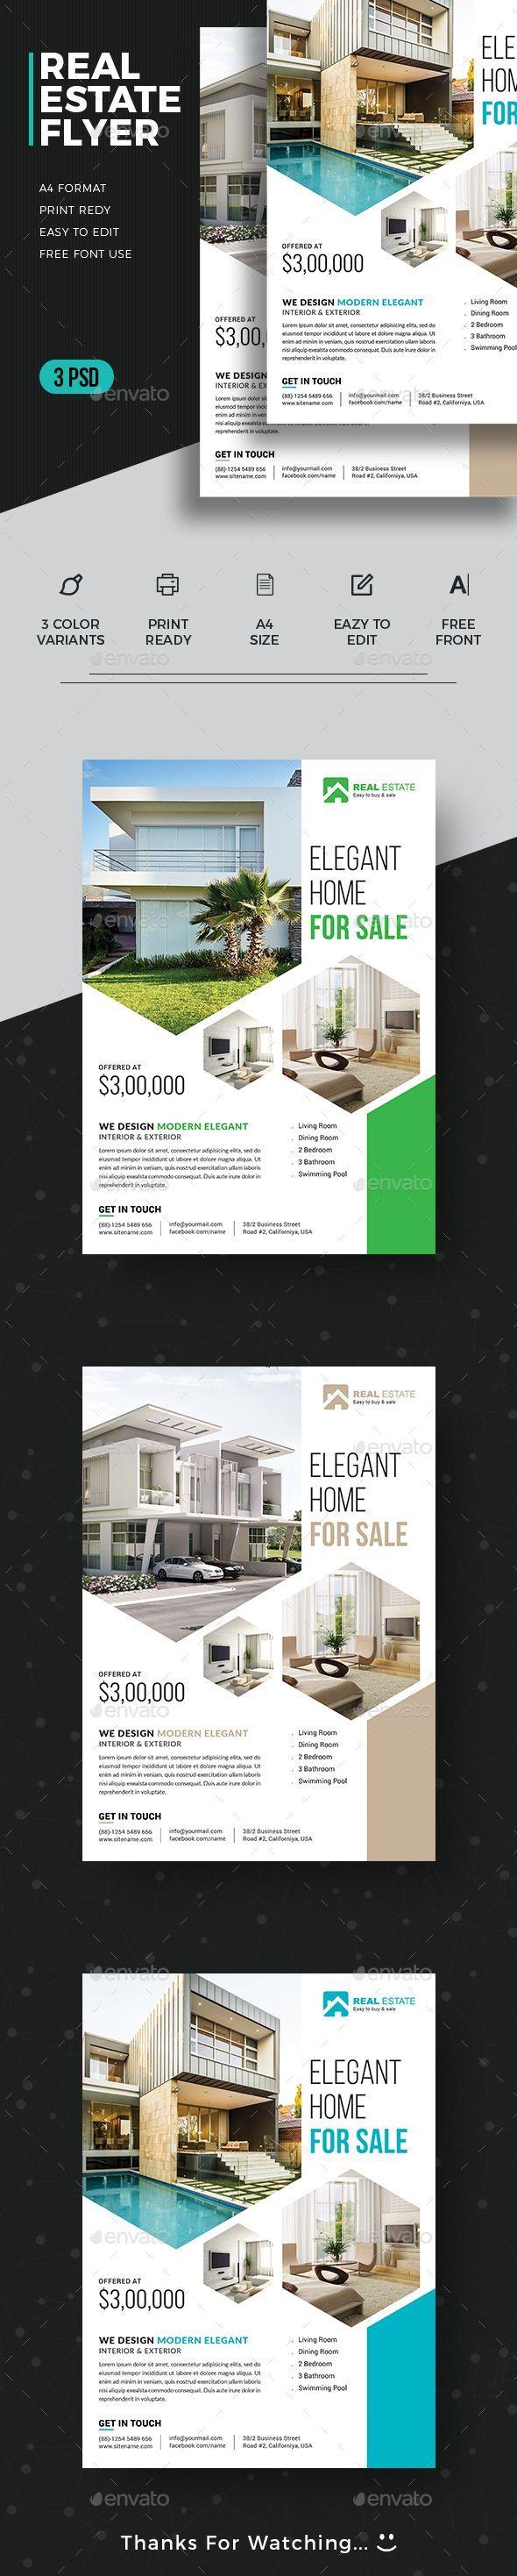 #Real #Estate #Flyer - Commerce Flyers Download here: https://graphicriver.net/item/real-estate-flyer/19550607?ref=alena994 #realestatebusiness